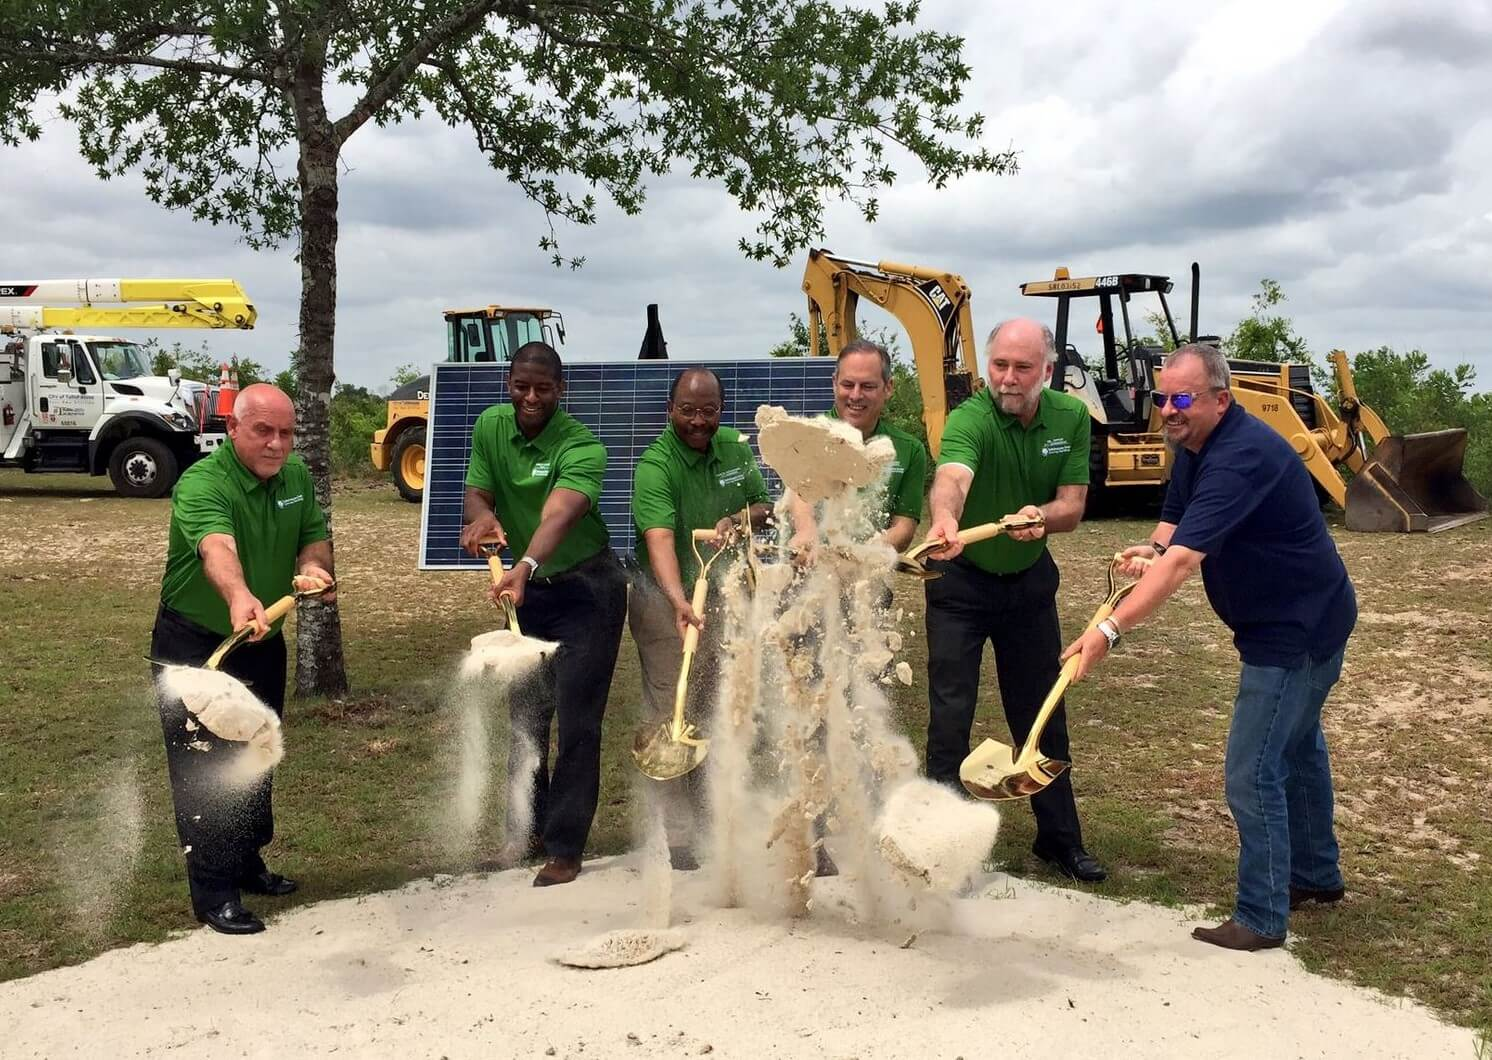 Origis-Florida Origis Breaks Ground On 20 MW Tallahassee Solar Project